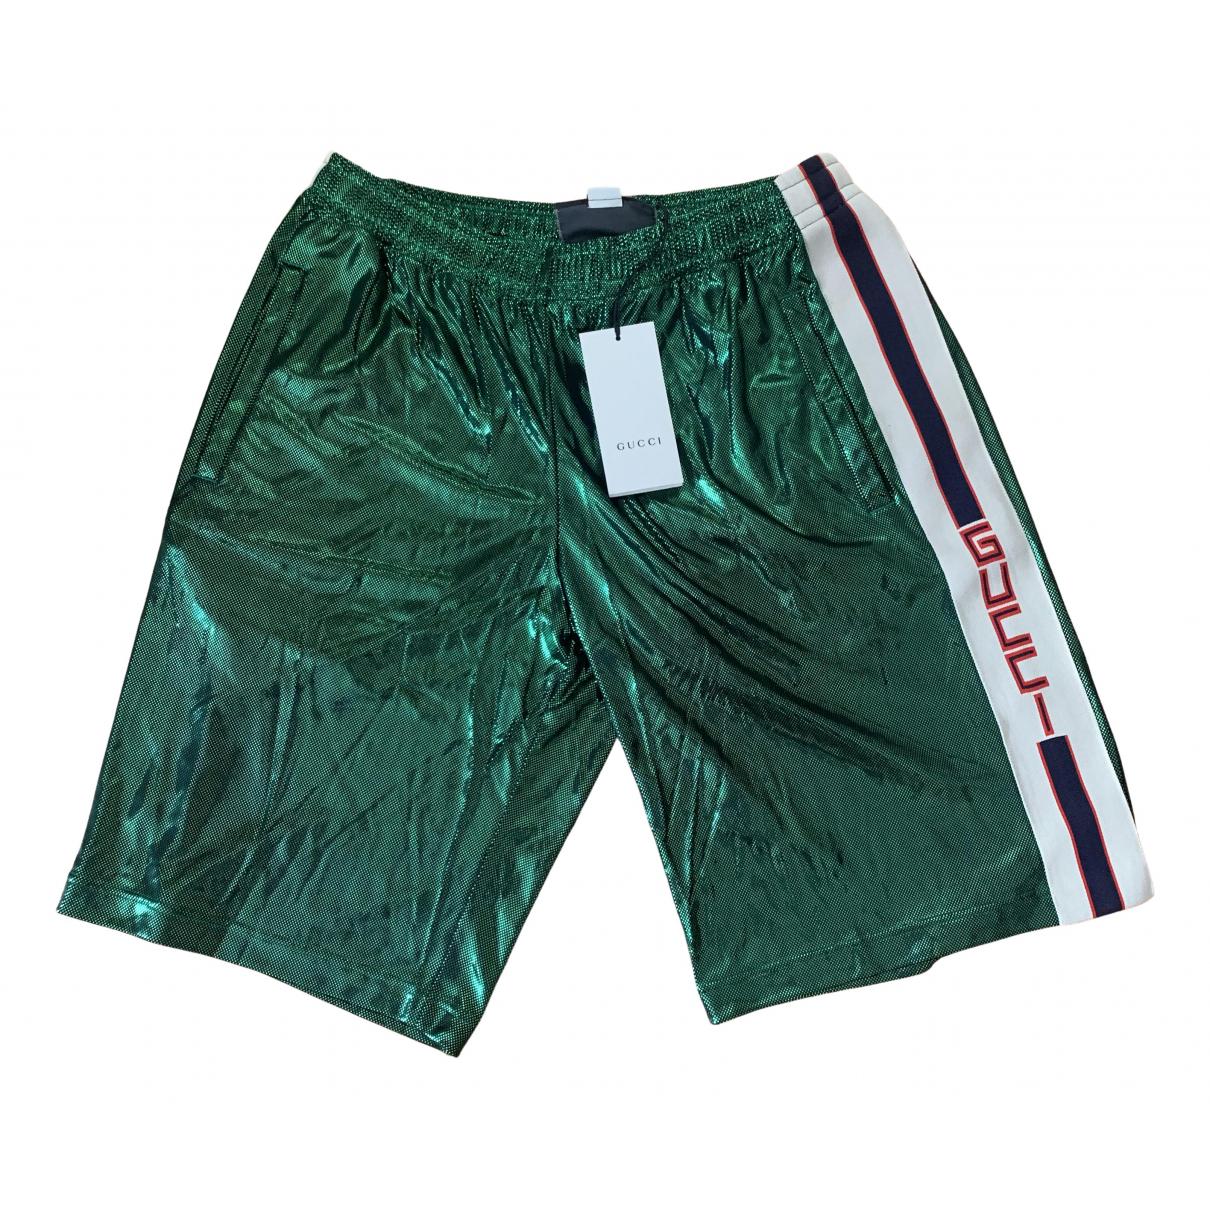 Gucci \N Green Shorts for Men M International